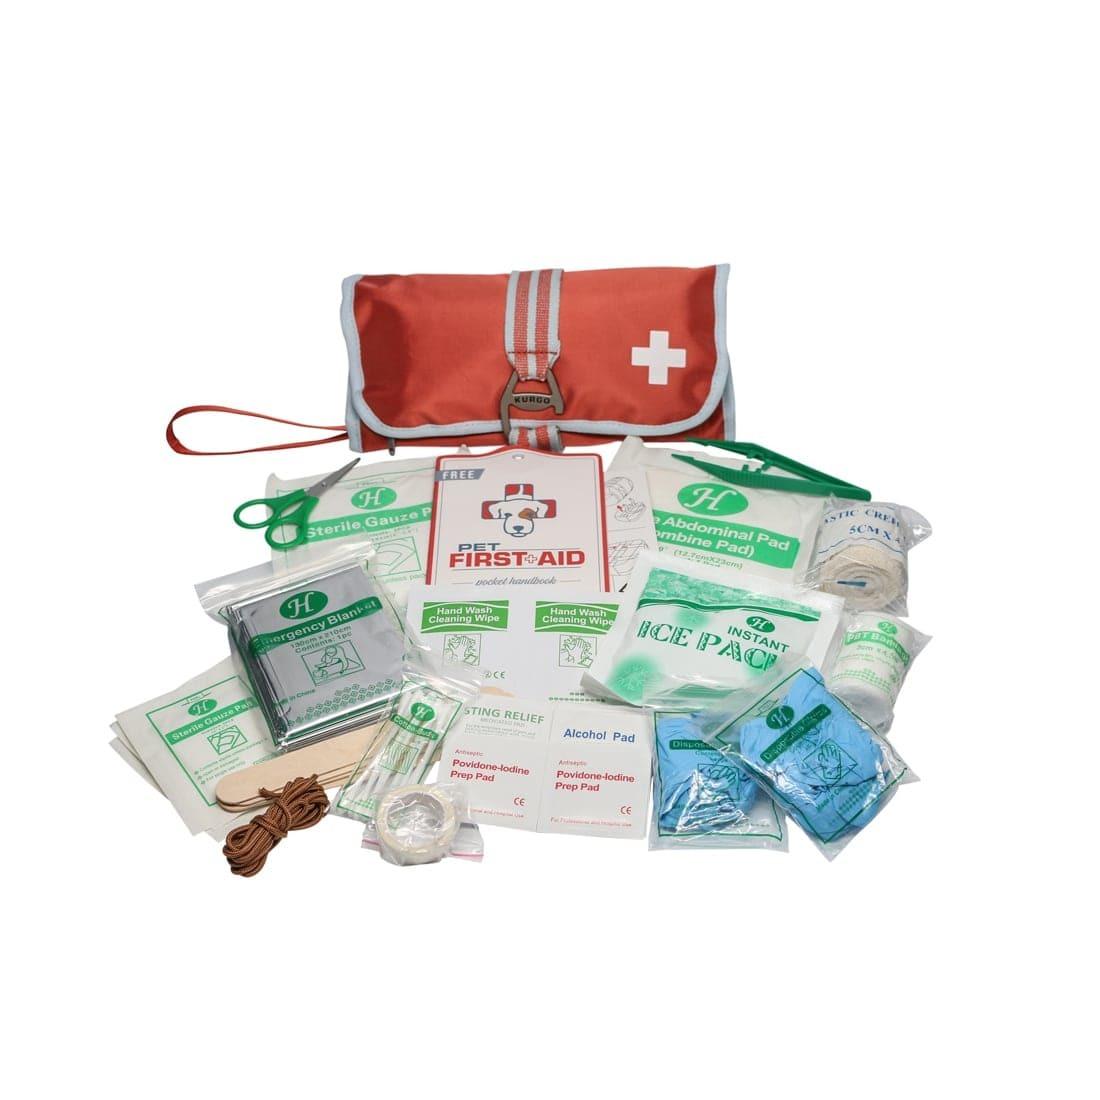 Kurgo First Aid Kit -- road trip emergency kit supplies